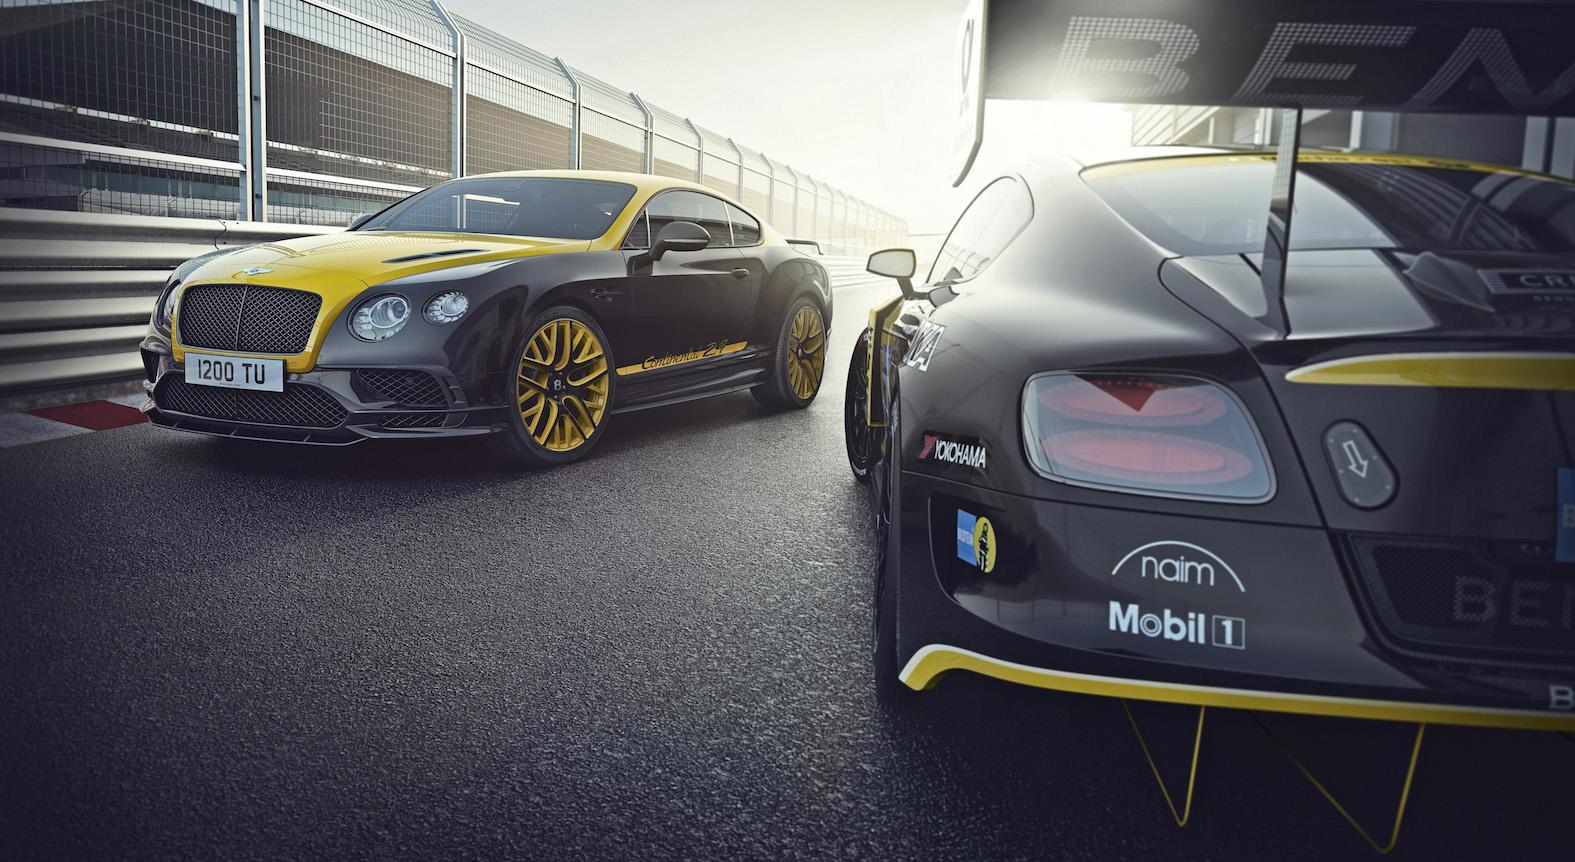 Bentley Continental 24 Celebrates Nurburgring 24-Hour Return